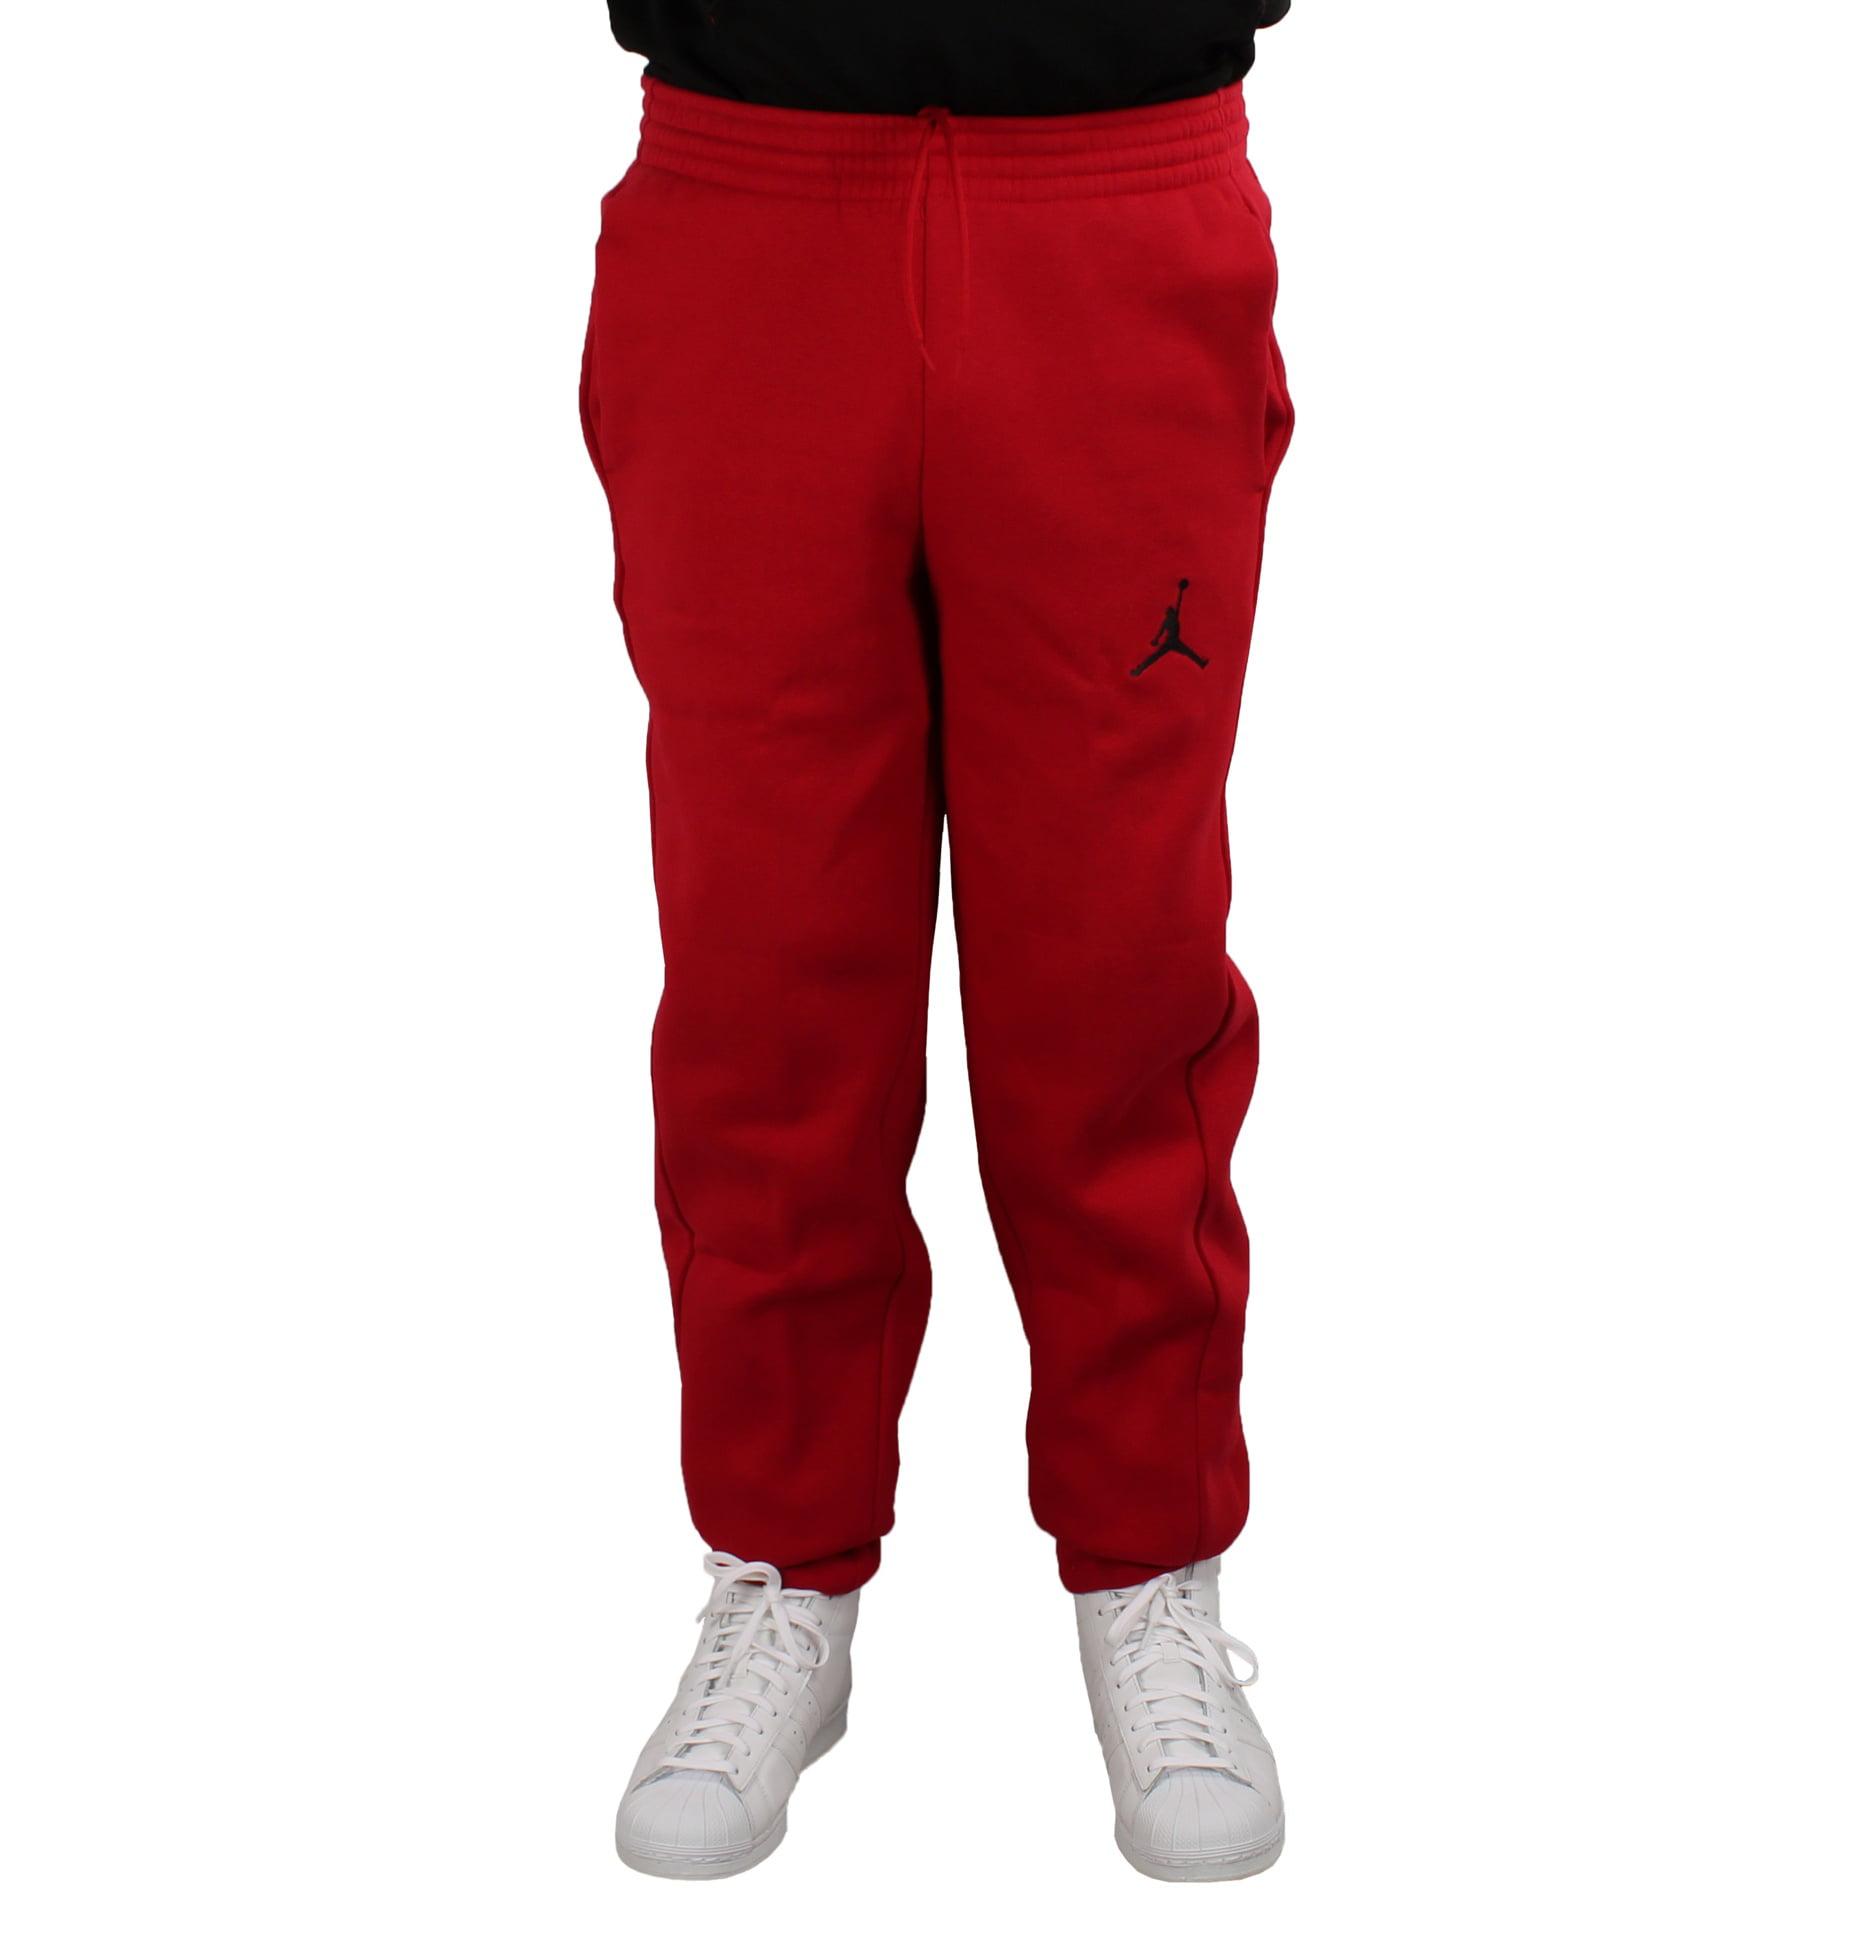 Nike Air Jordan Flight Fleece Red Men's